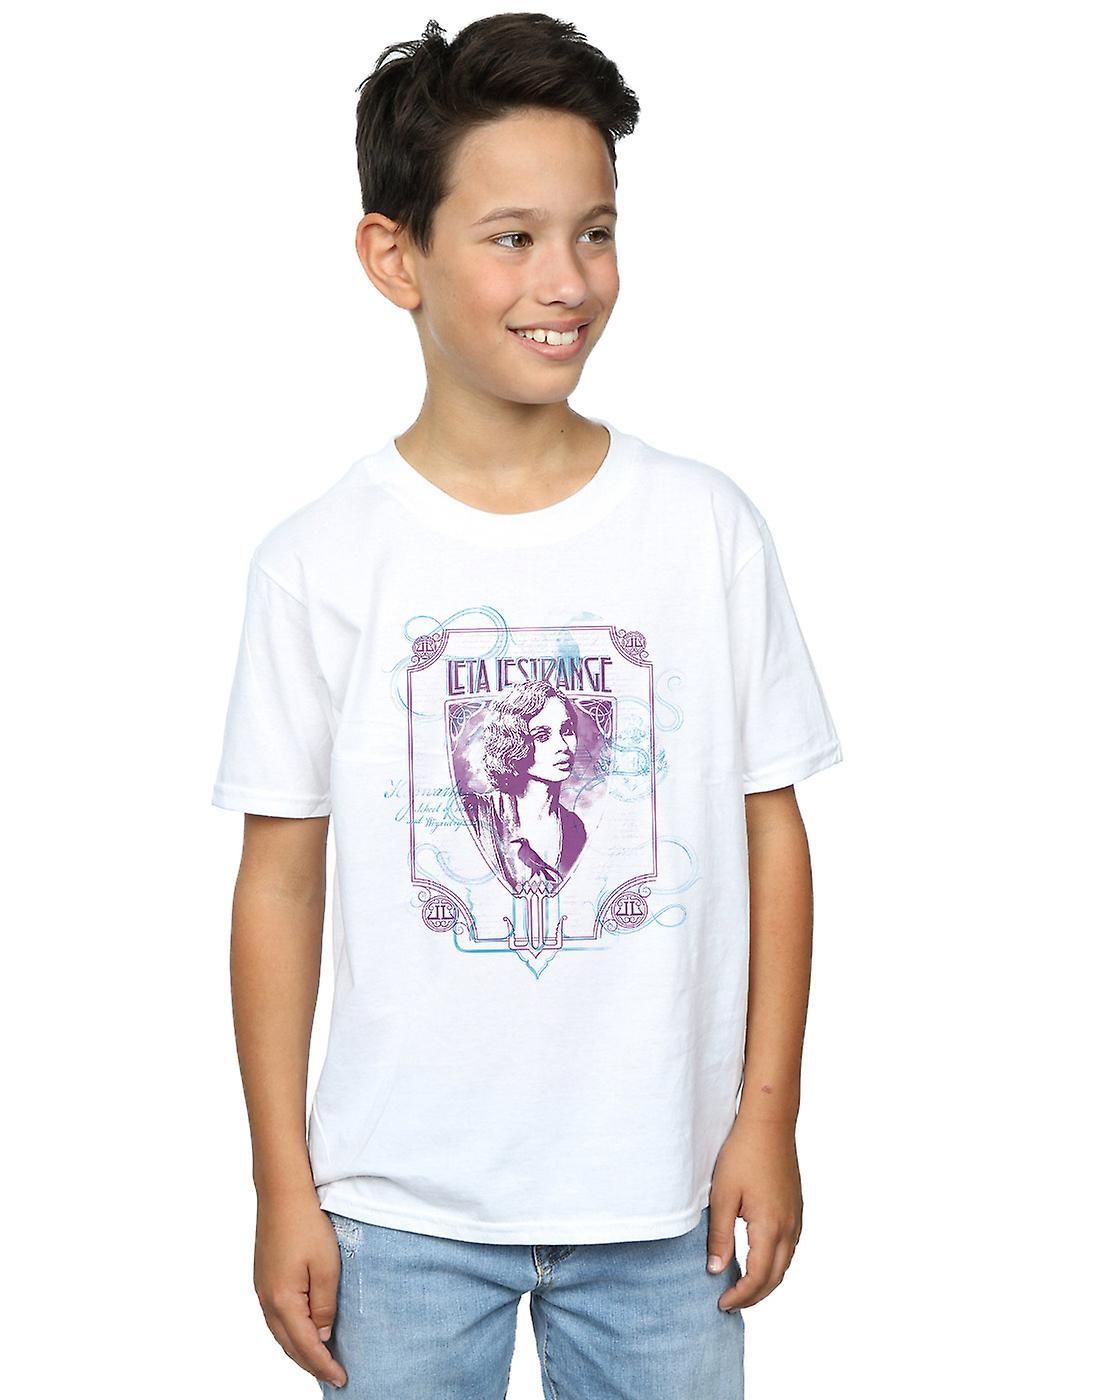 Fantastic Beasts Boys Leta Lestrange T-Shirt